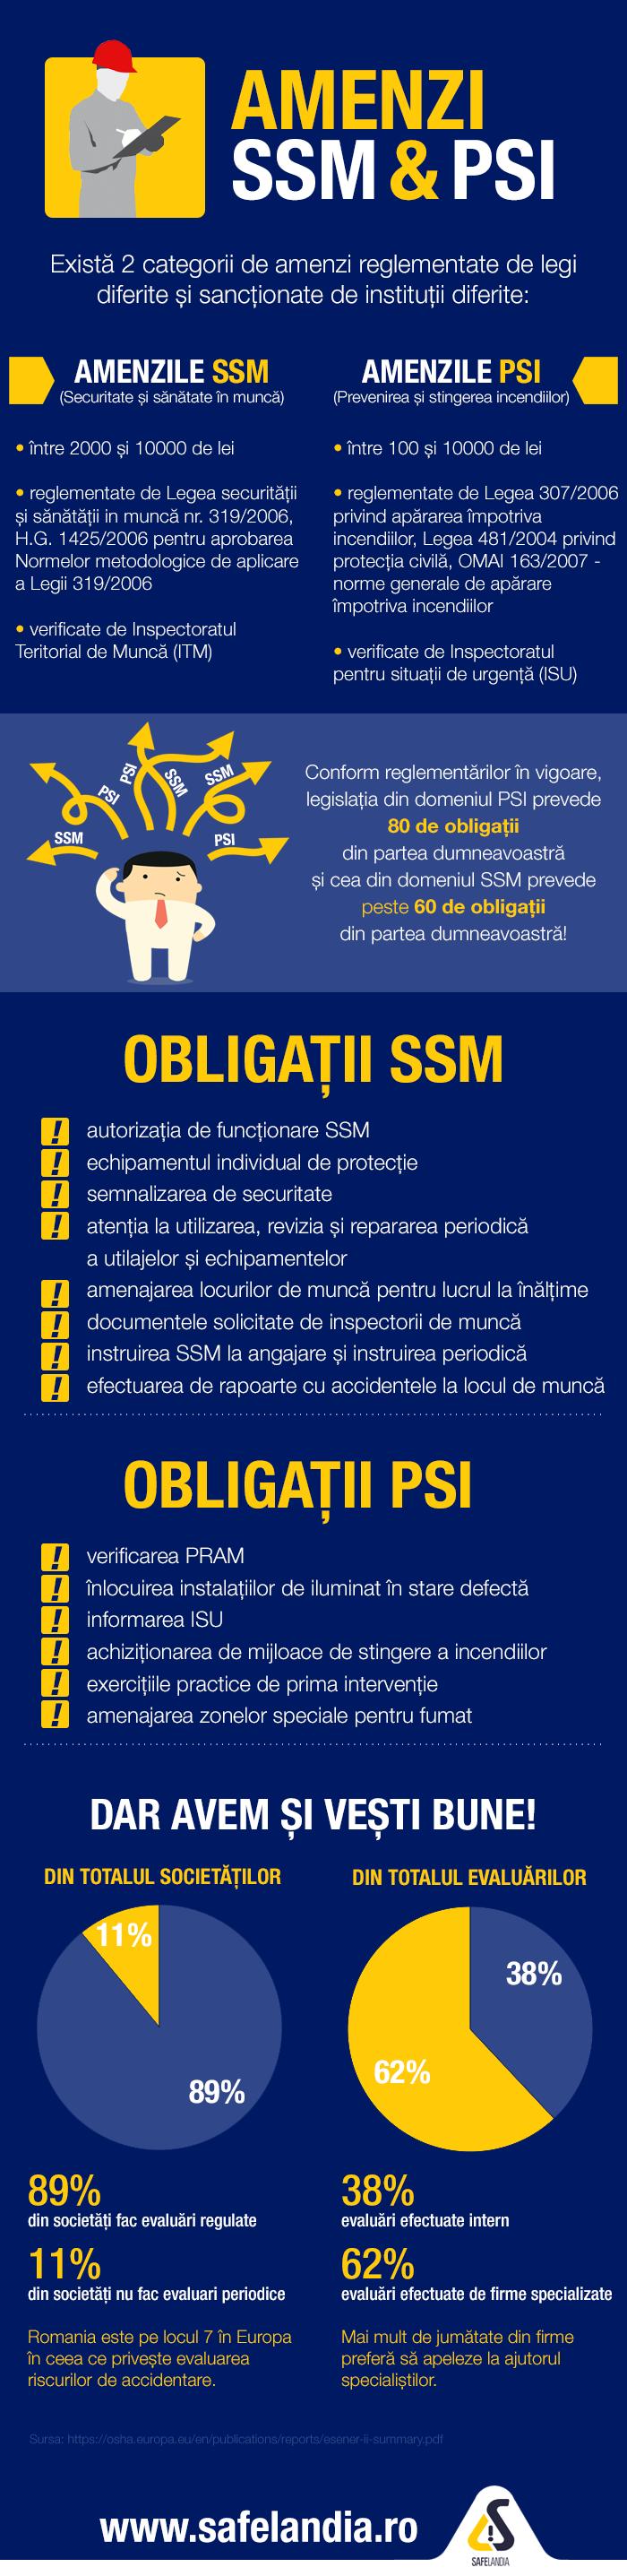 infographic_amenzi_ssm_psi